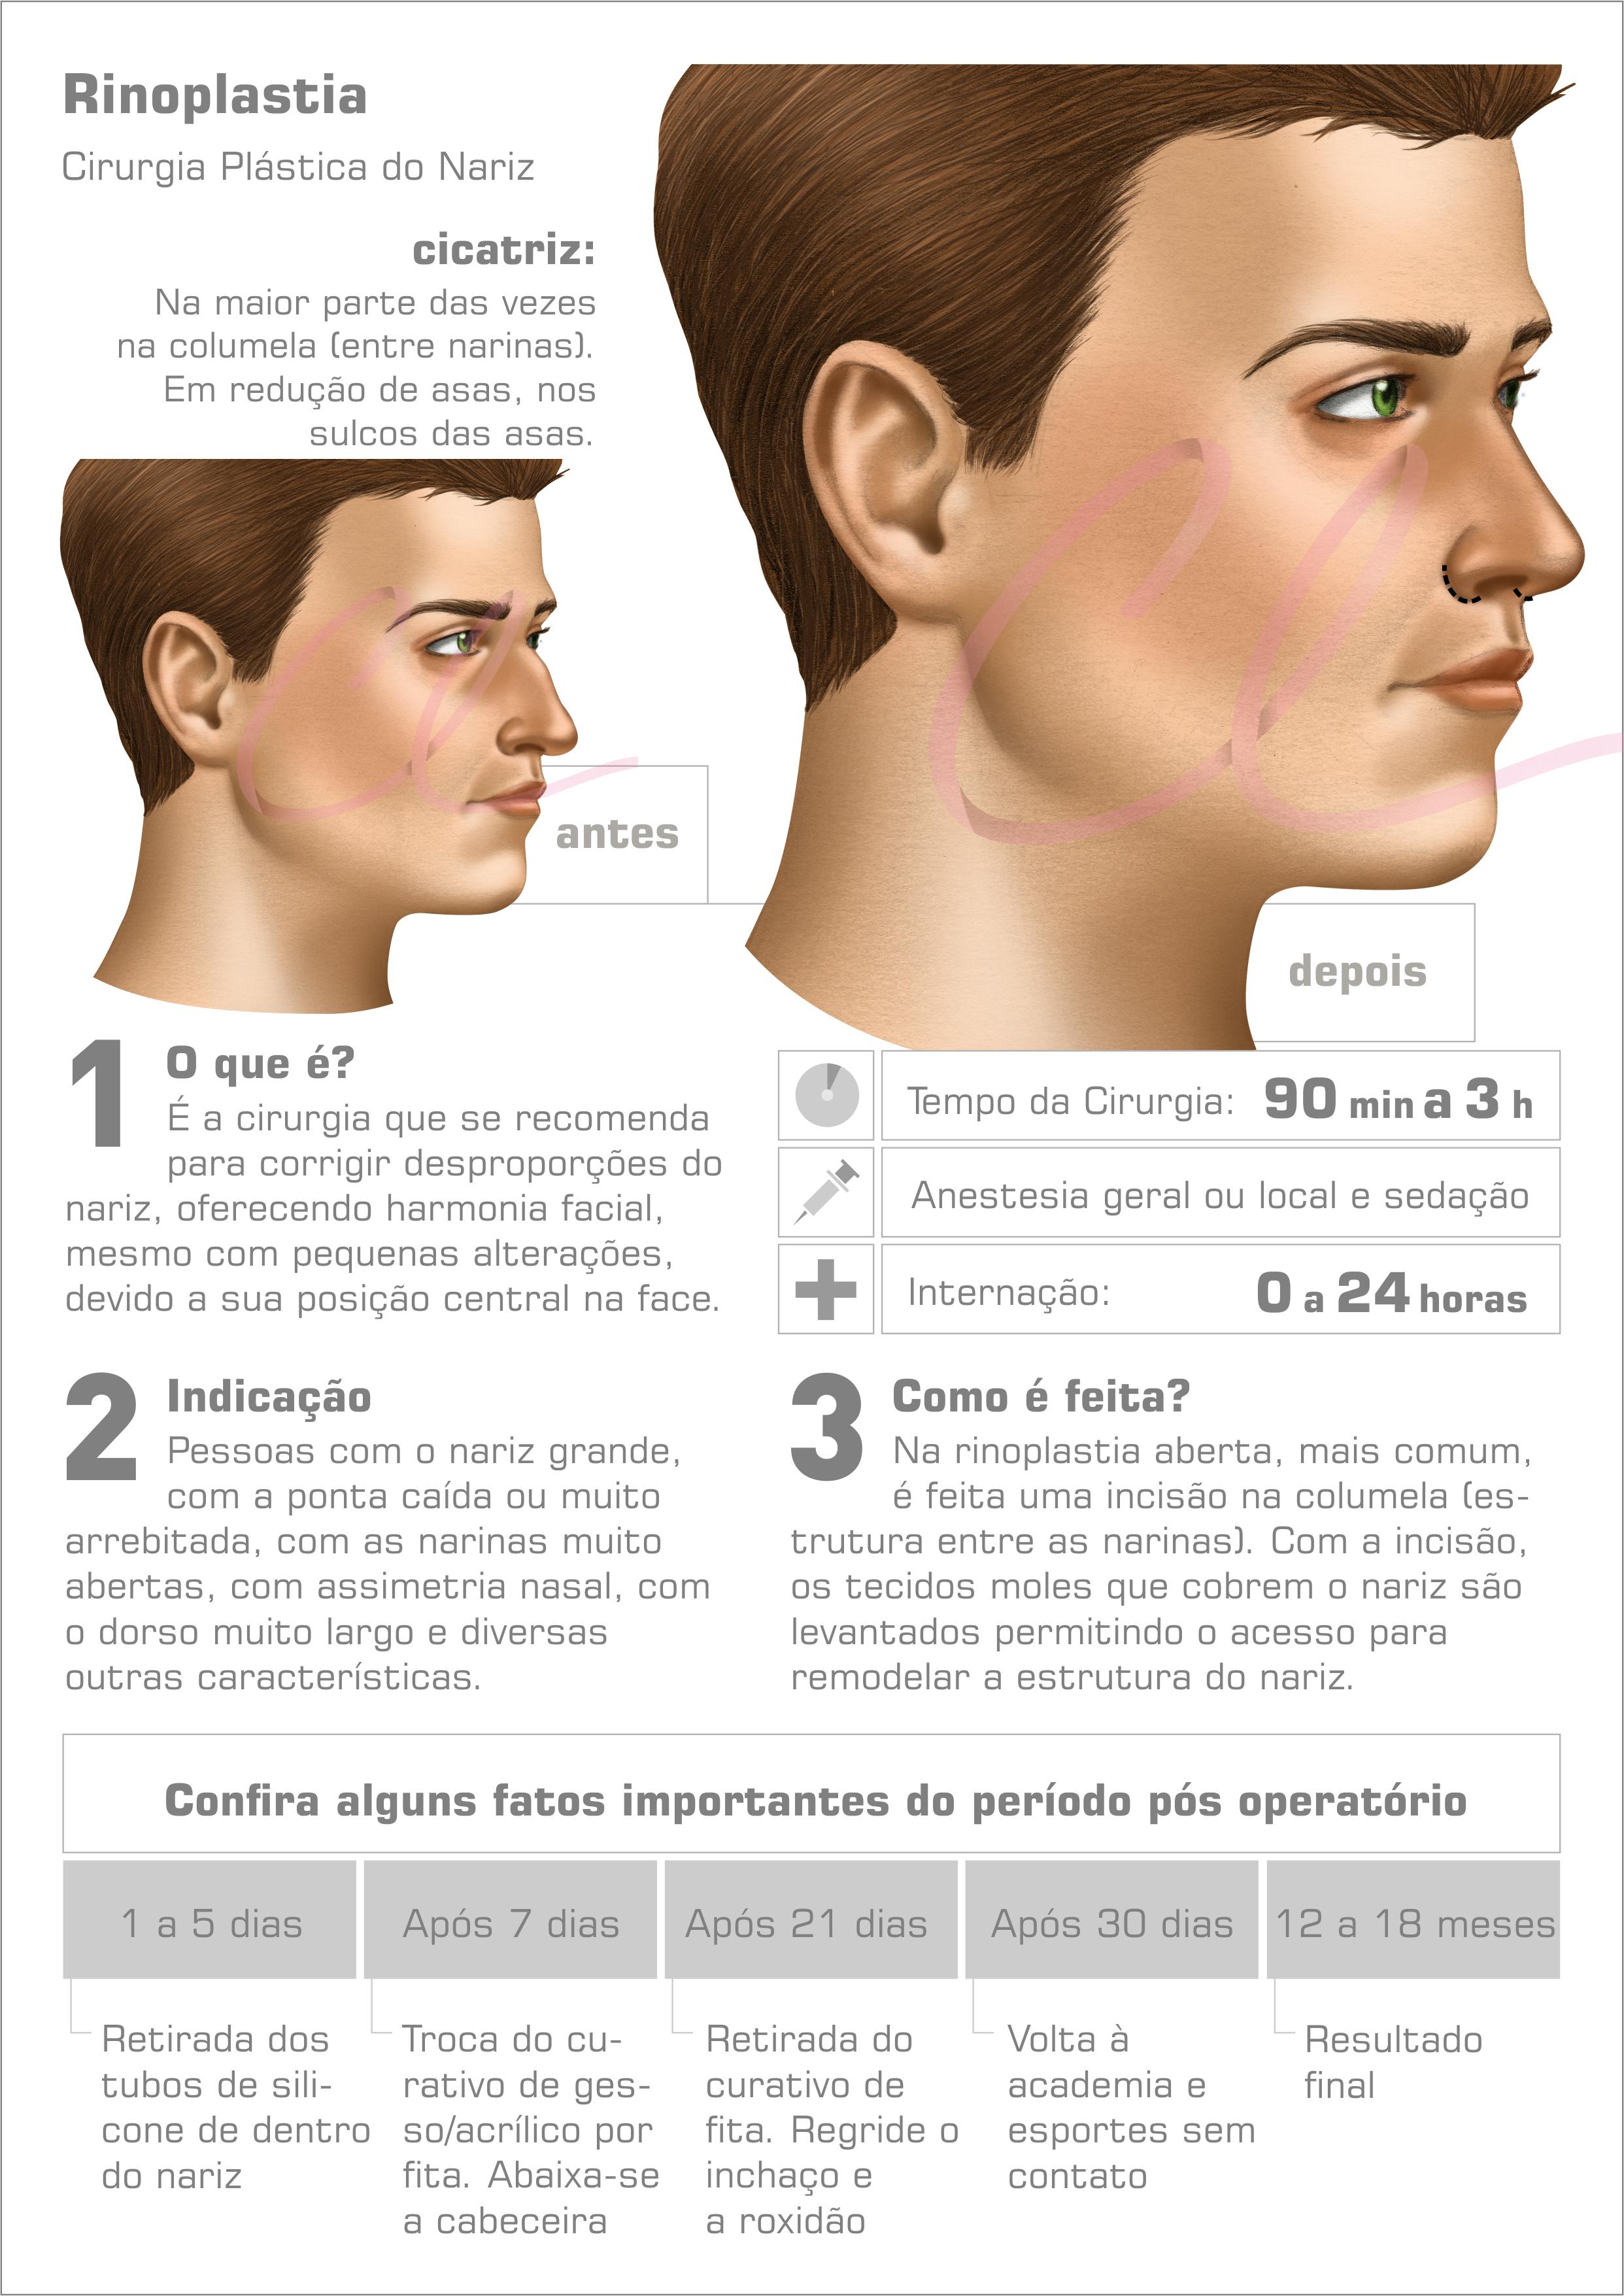 Cirurgia de Rinoplastia